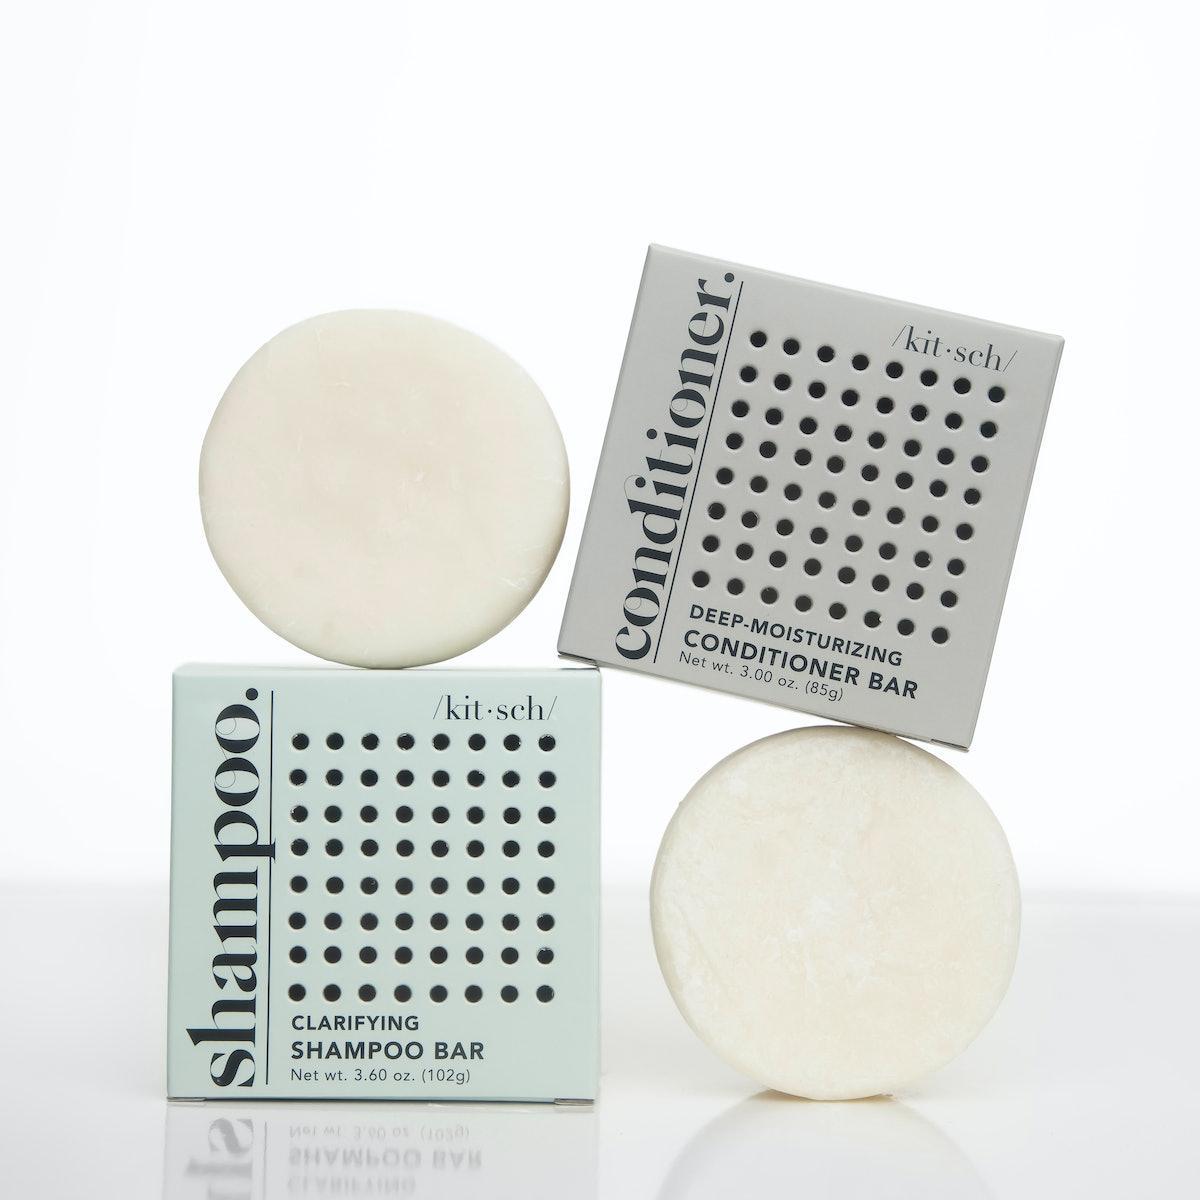 Clarifying Shampoo Bar & Deep-Moisturizing Conditioner Bar